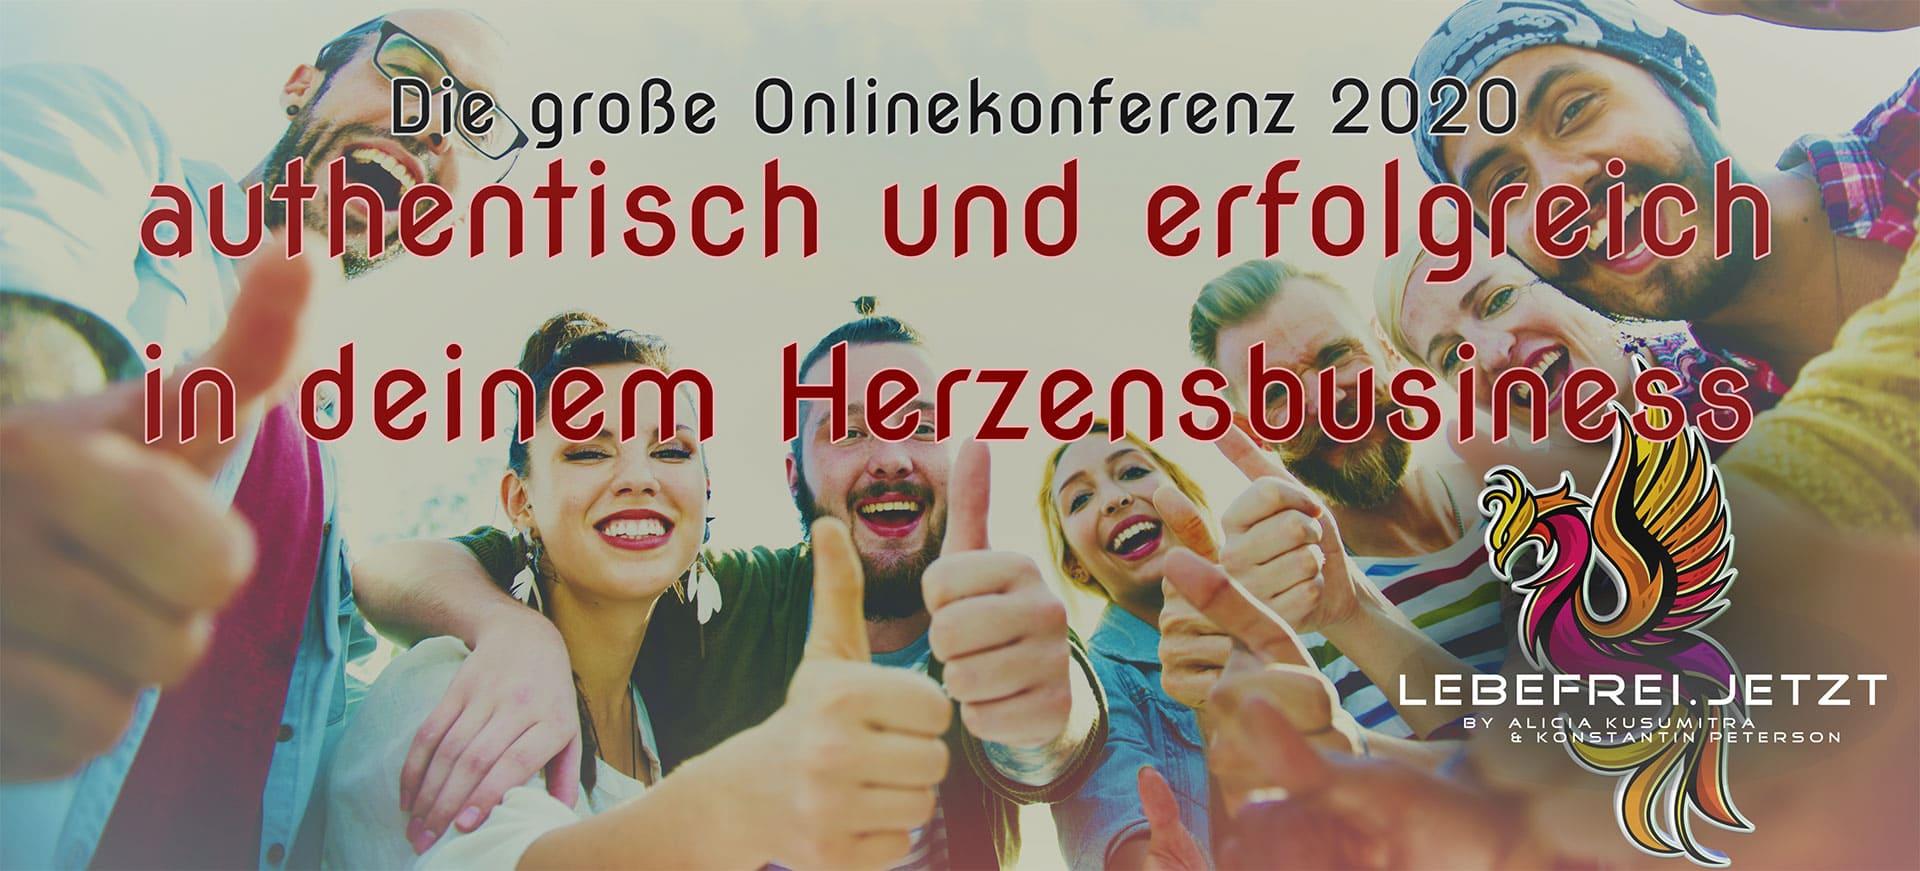 Die große Herzensbusiness Onlinekonferenz 2020